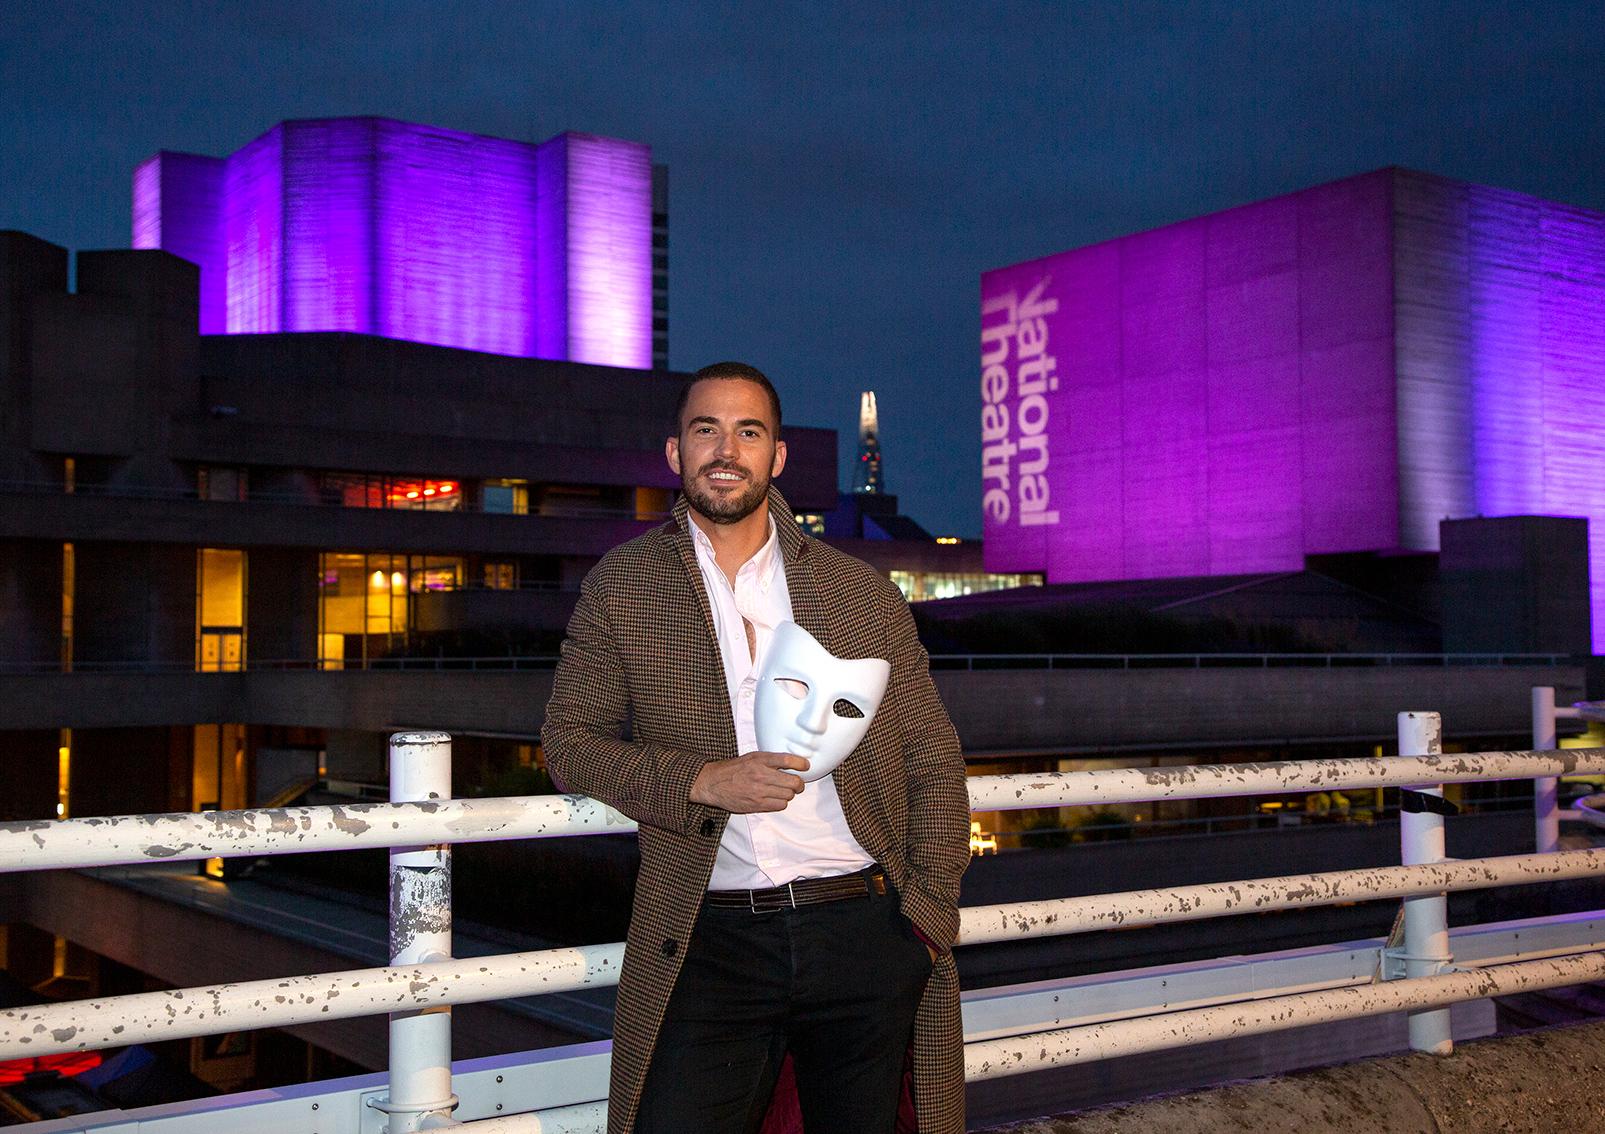 Juan Labourt - EMEA News Strategic Partner Manager, Google